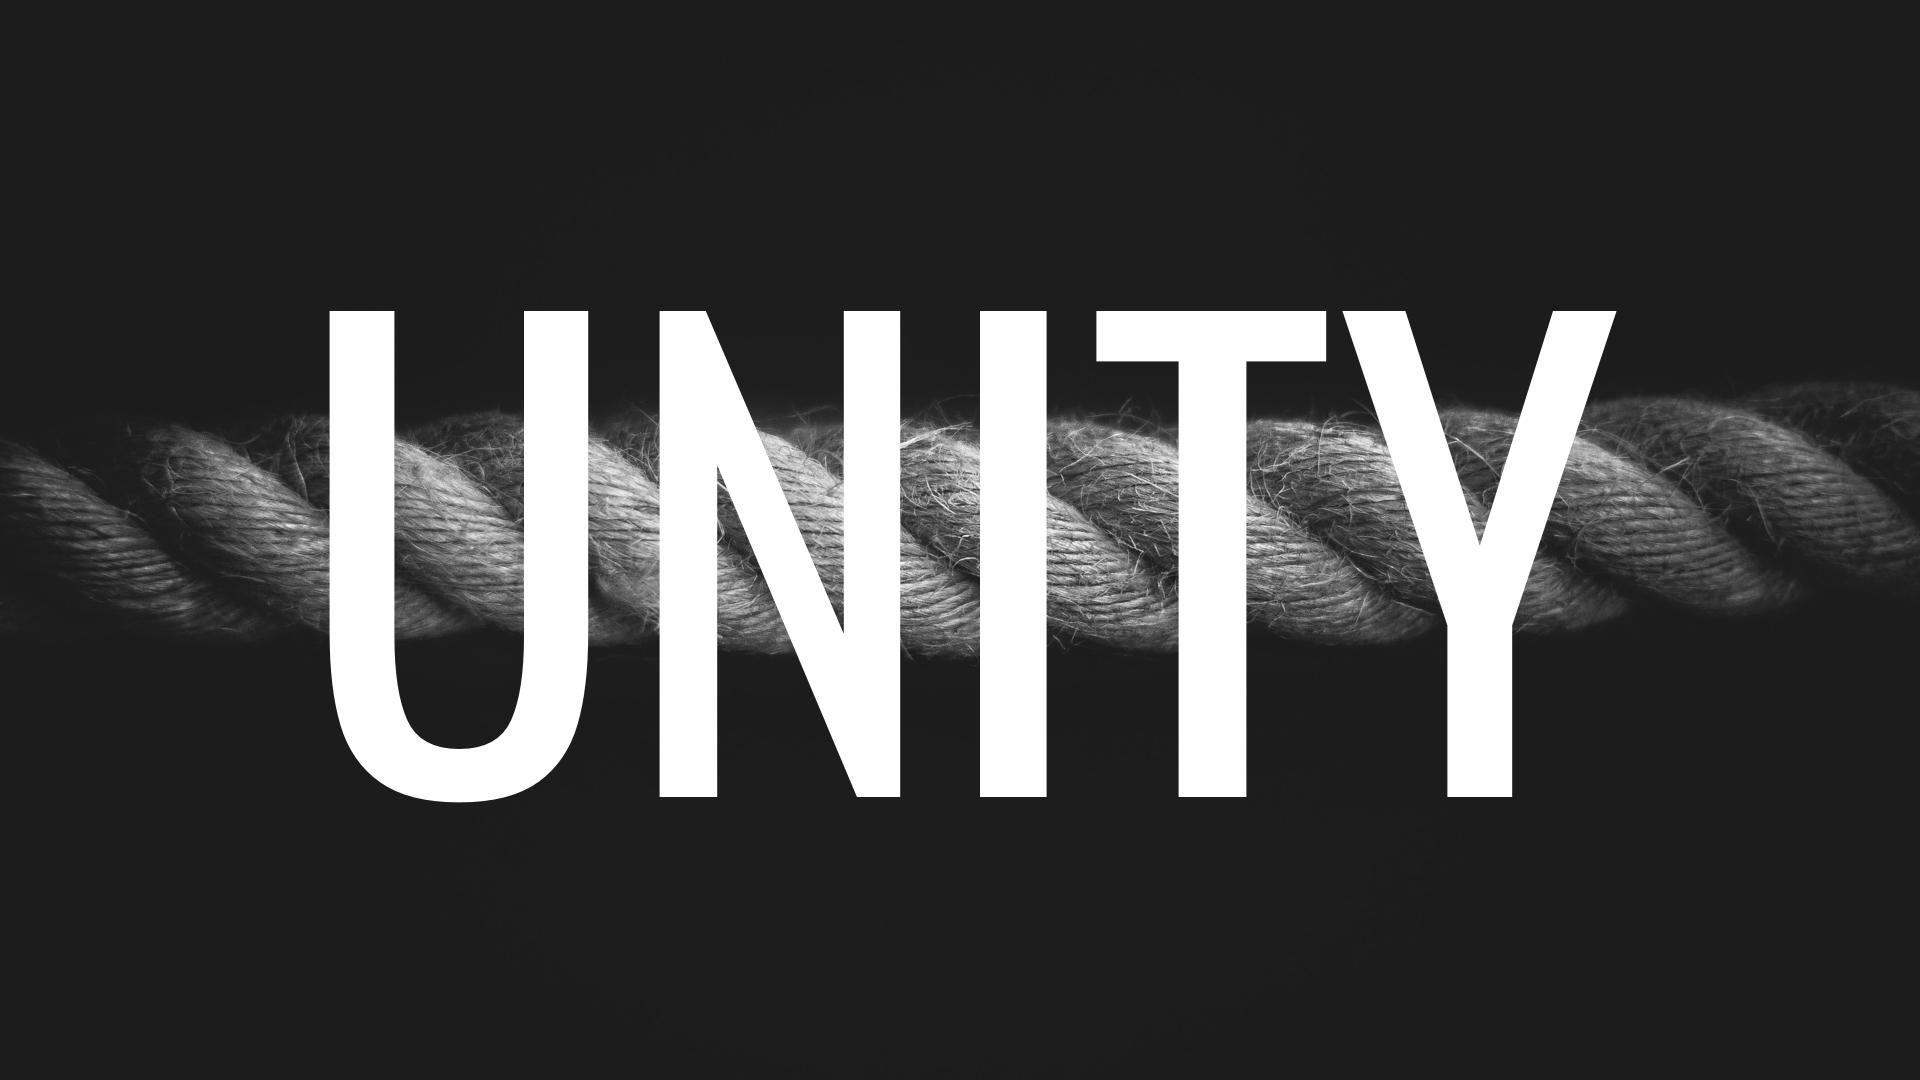 June 17. 2018 - UNITY.002.jpeg